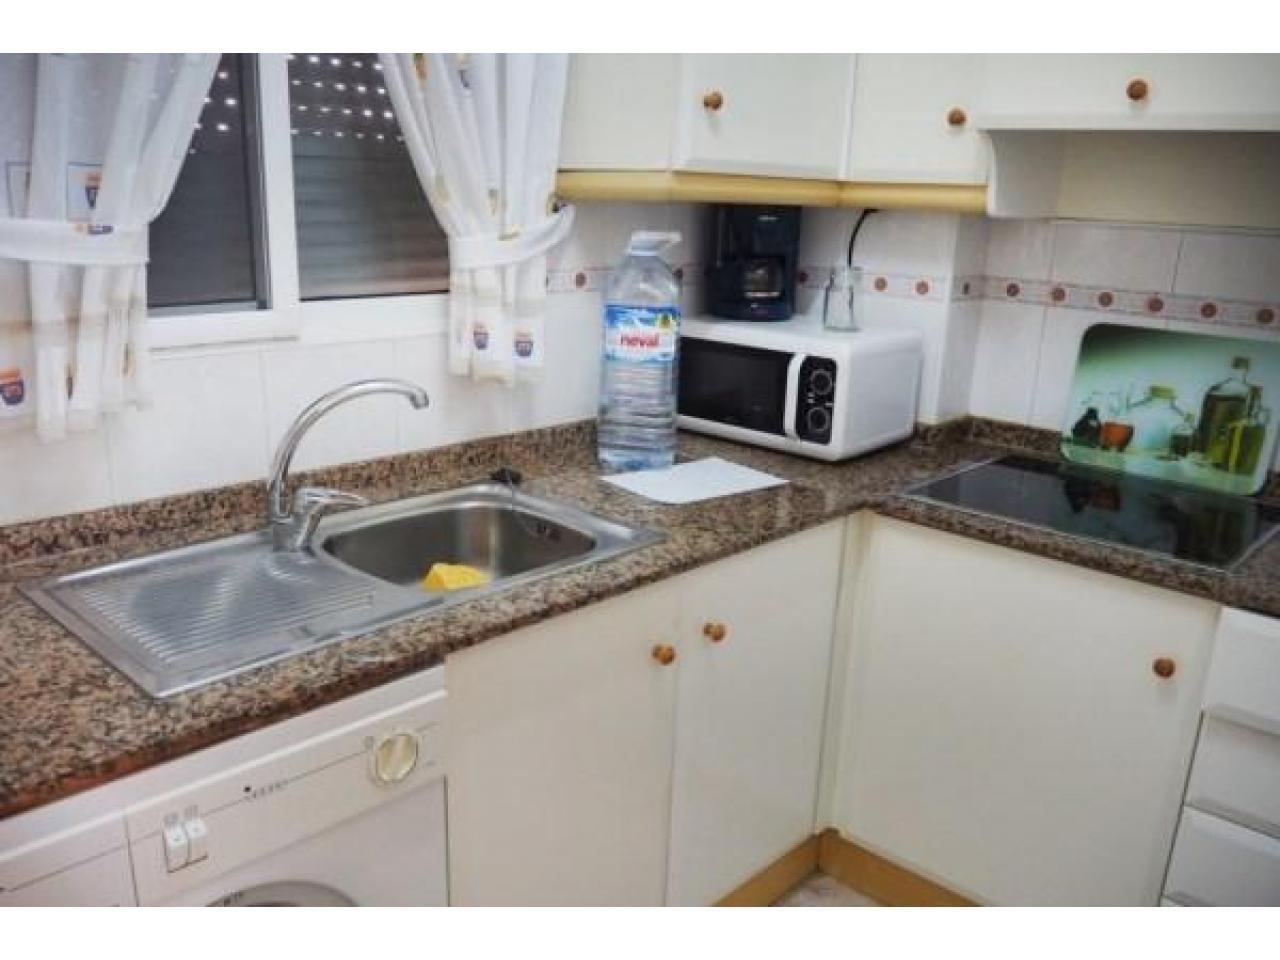 Недвижимость в Испании, Квартира c видами на море в Торревьеха,Коста Бланка,Испания - 6